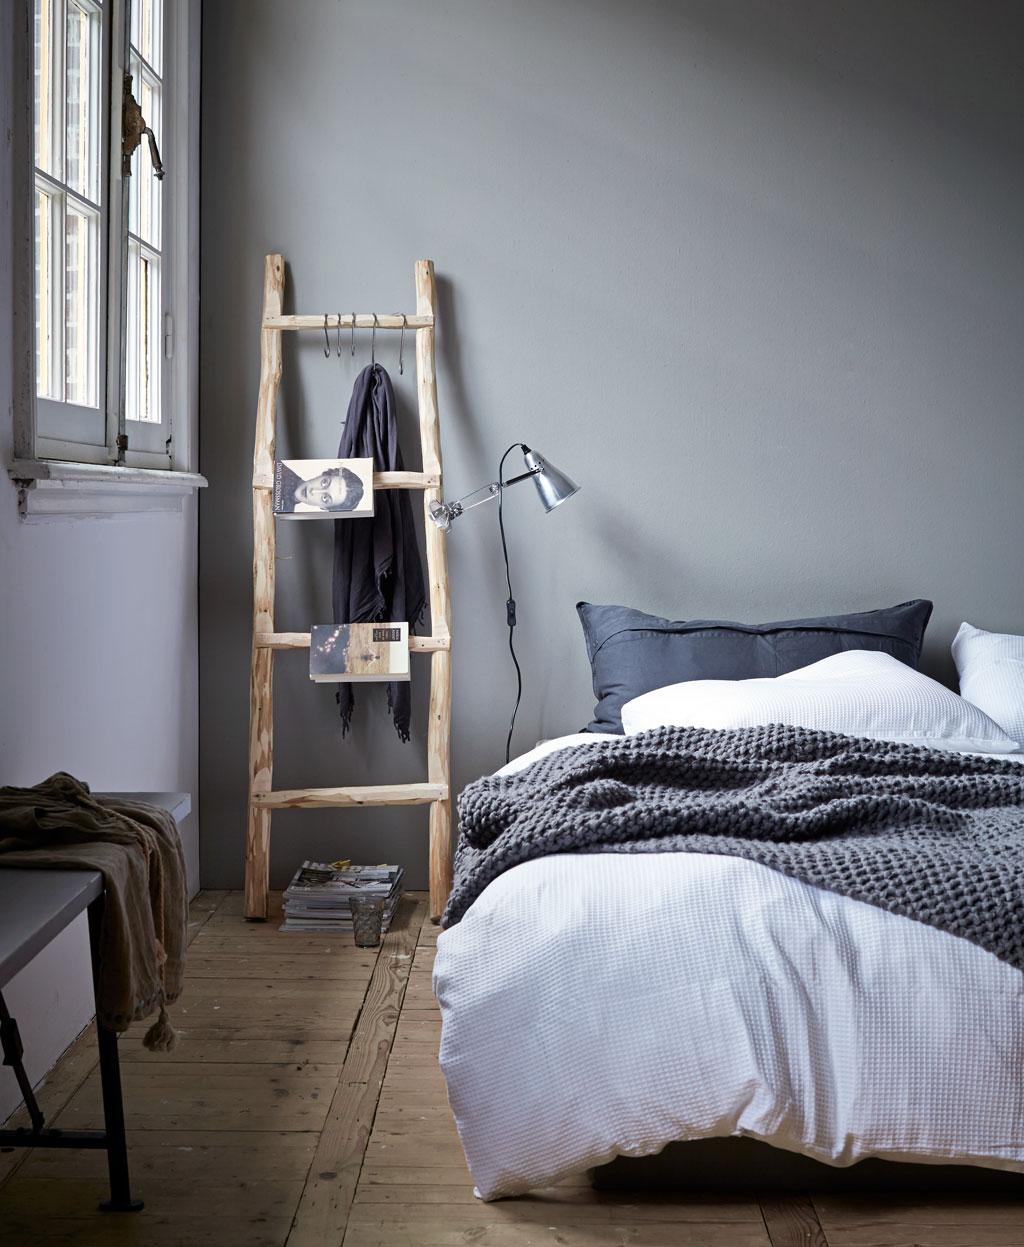 Ladder als nachtkastje